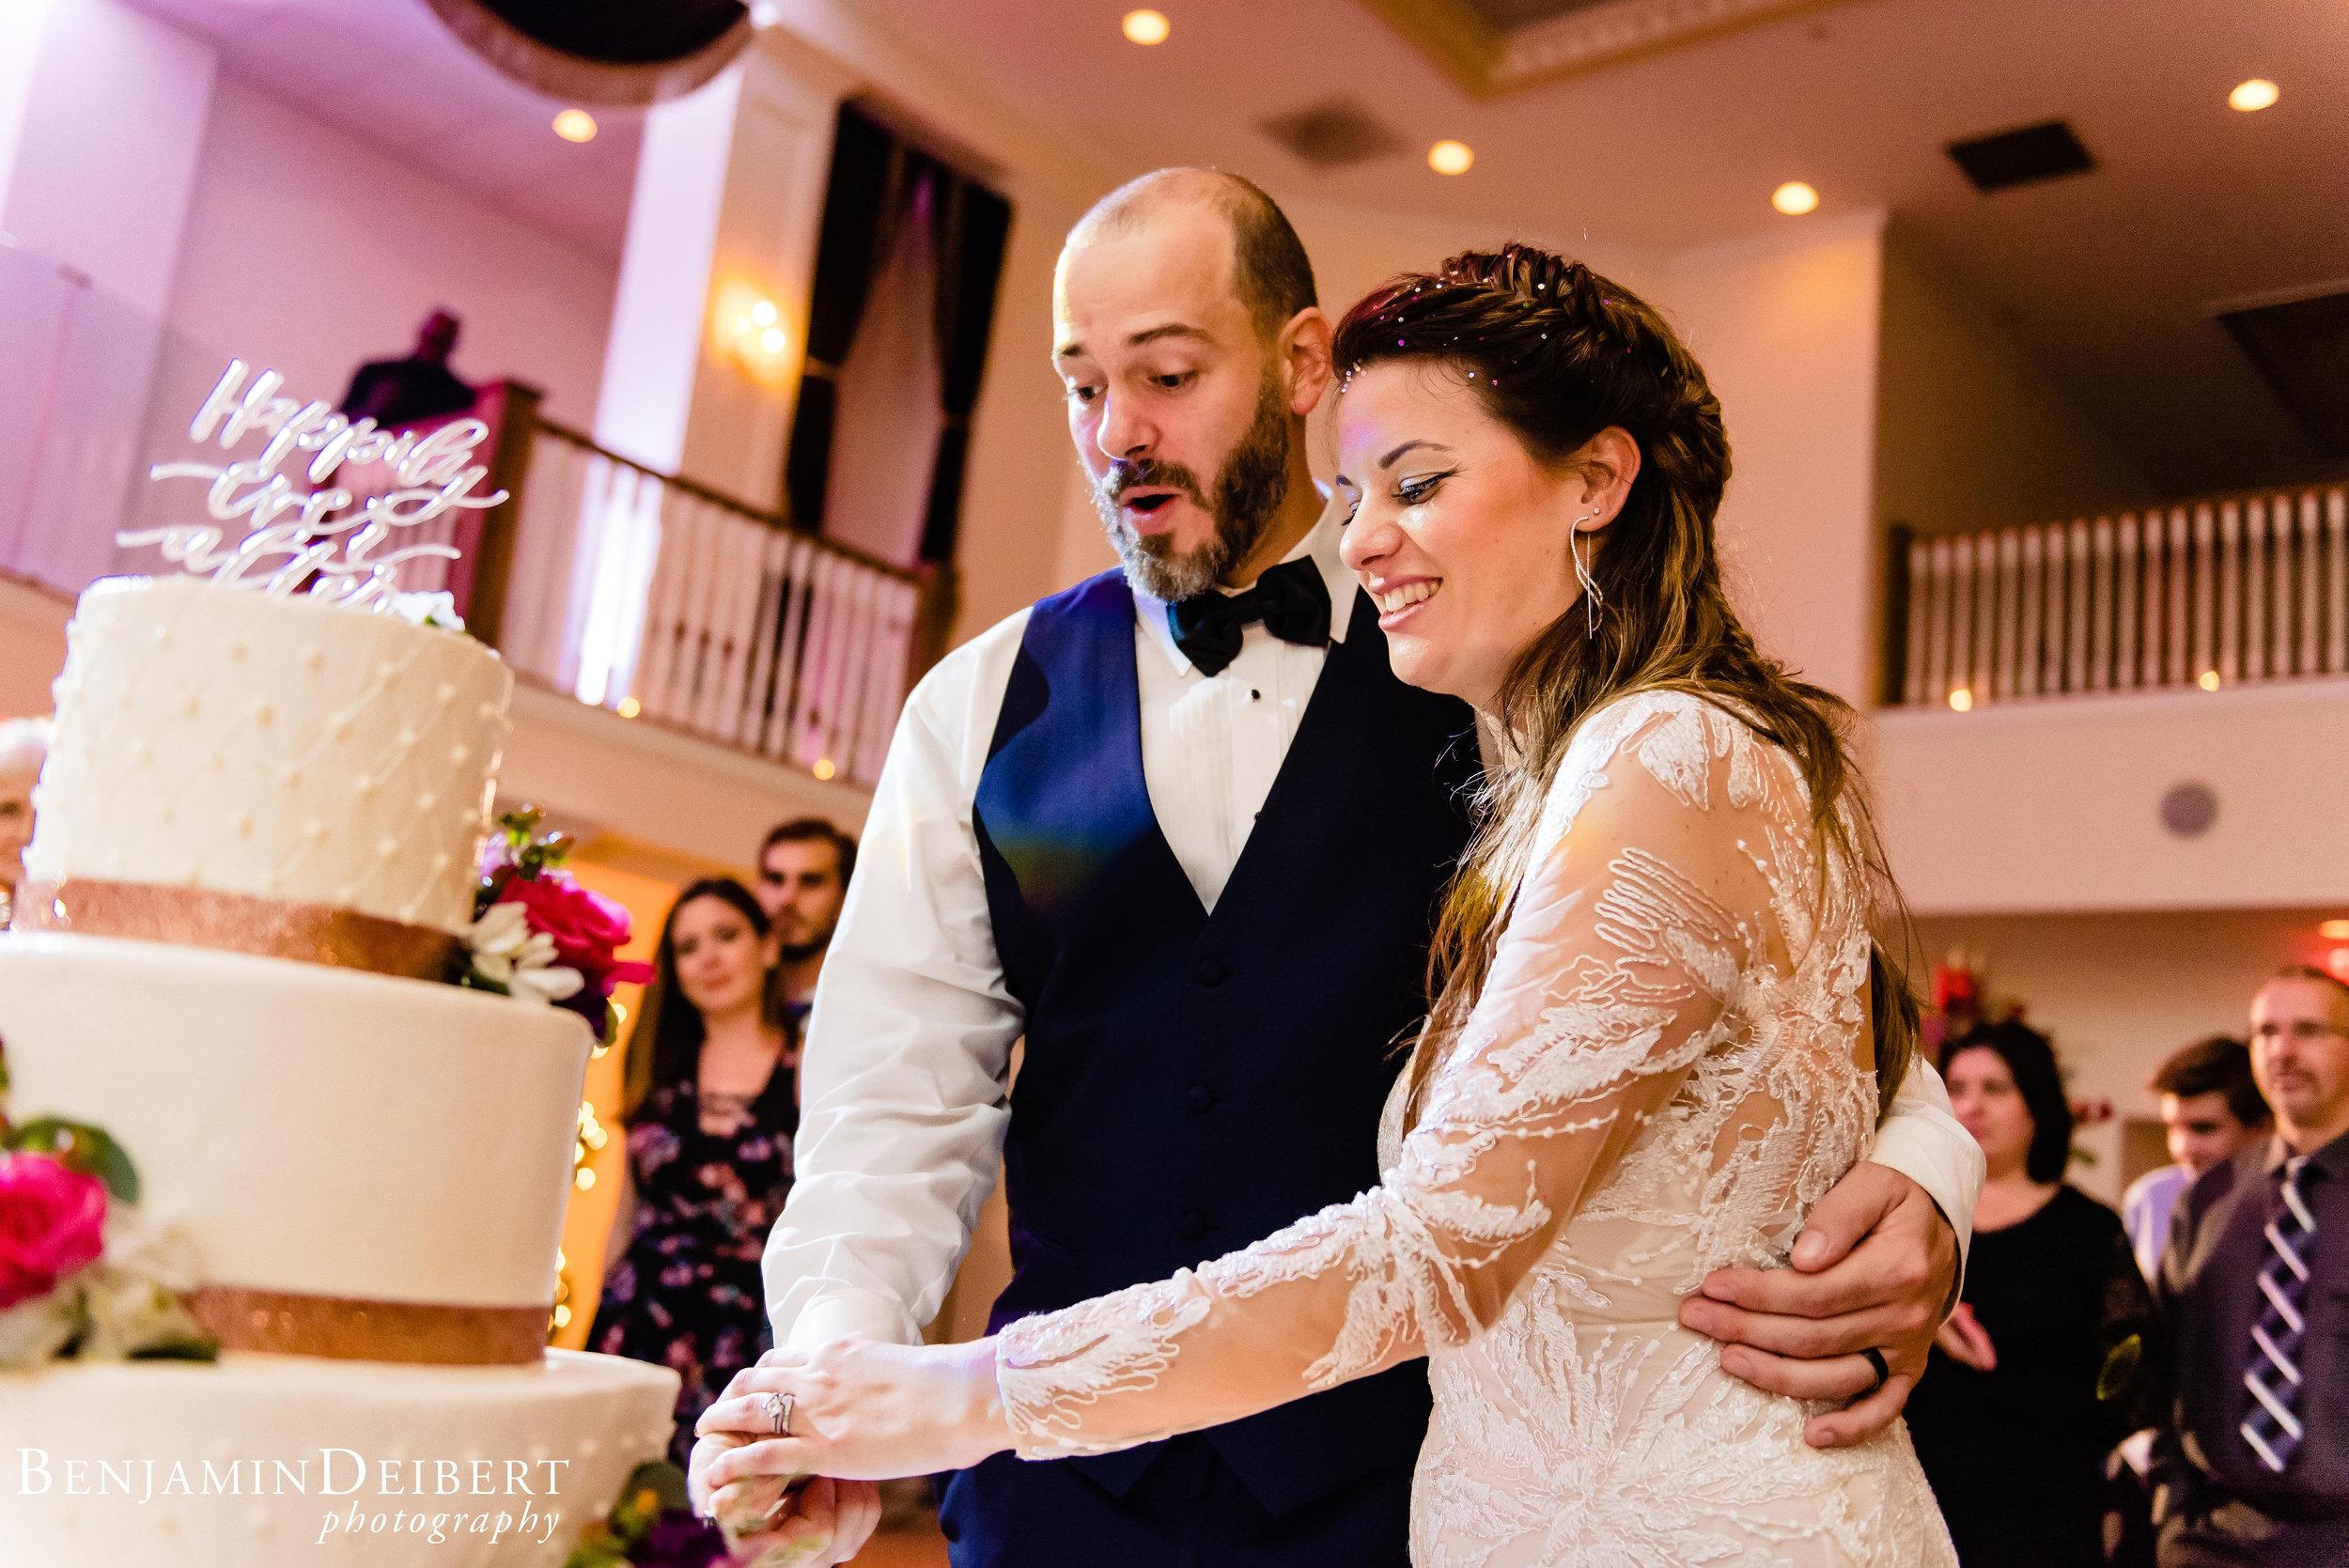 AmandaandElliott_TheCarriageHouse_Wedding-75.jpg